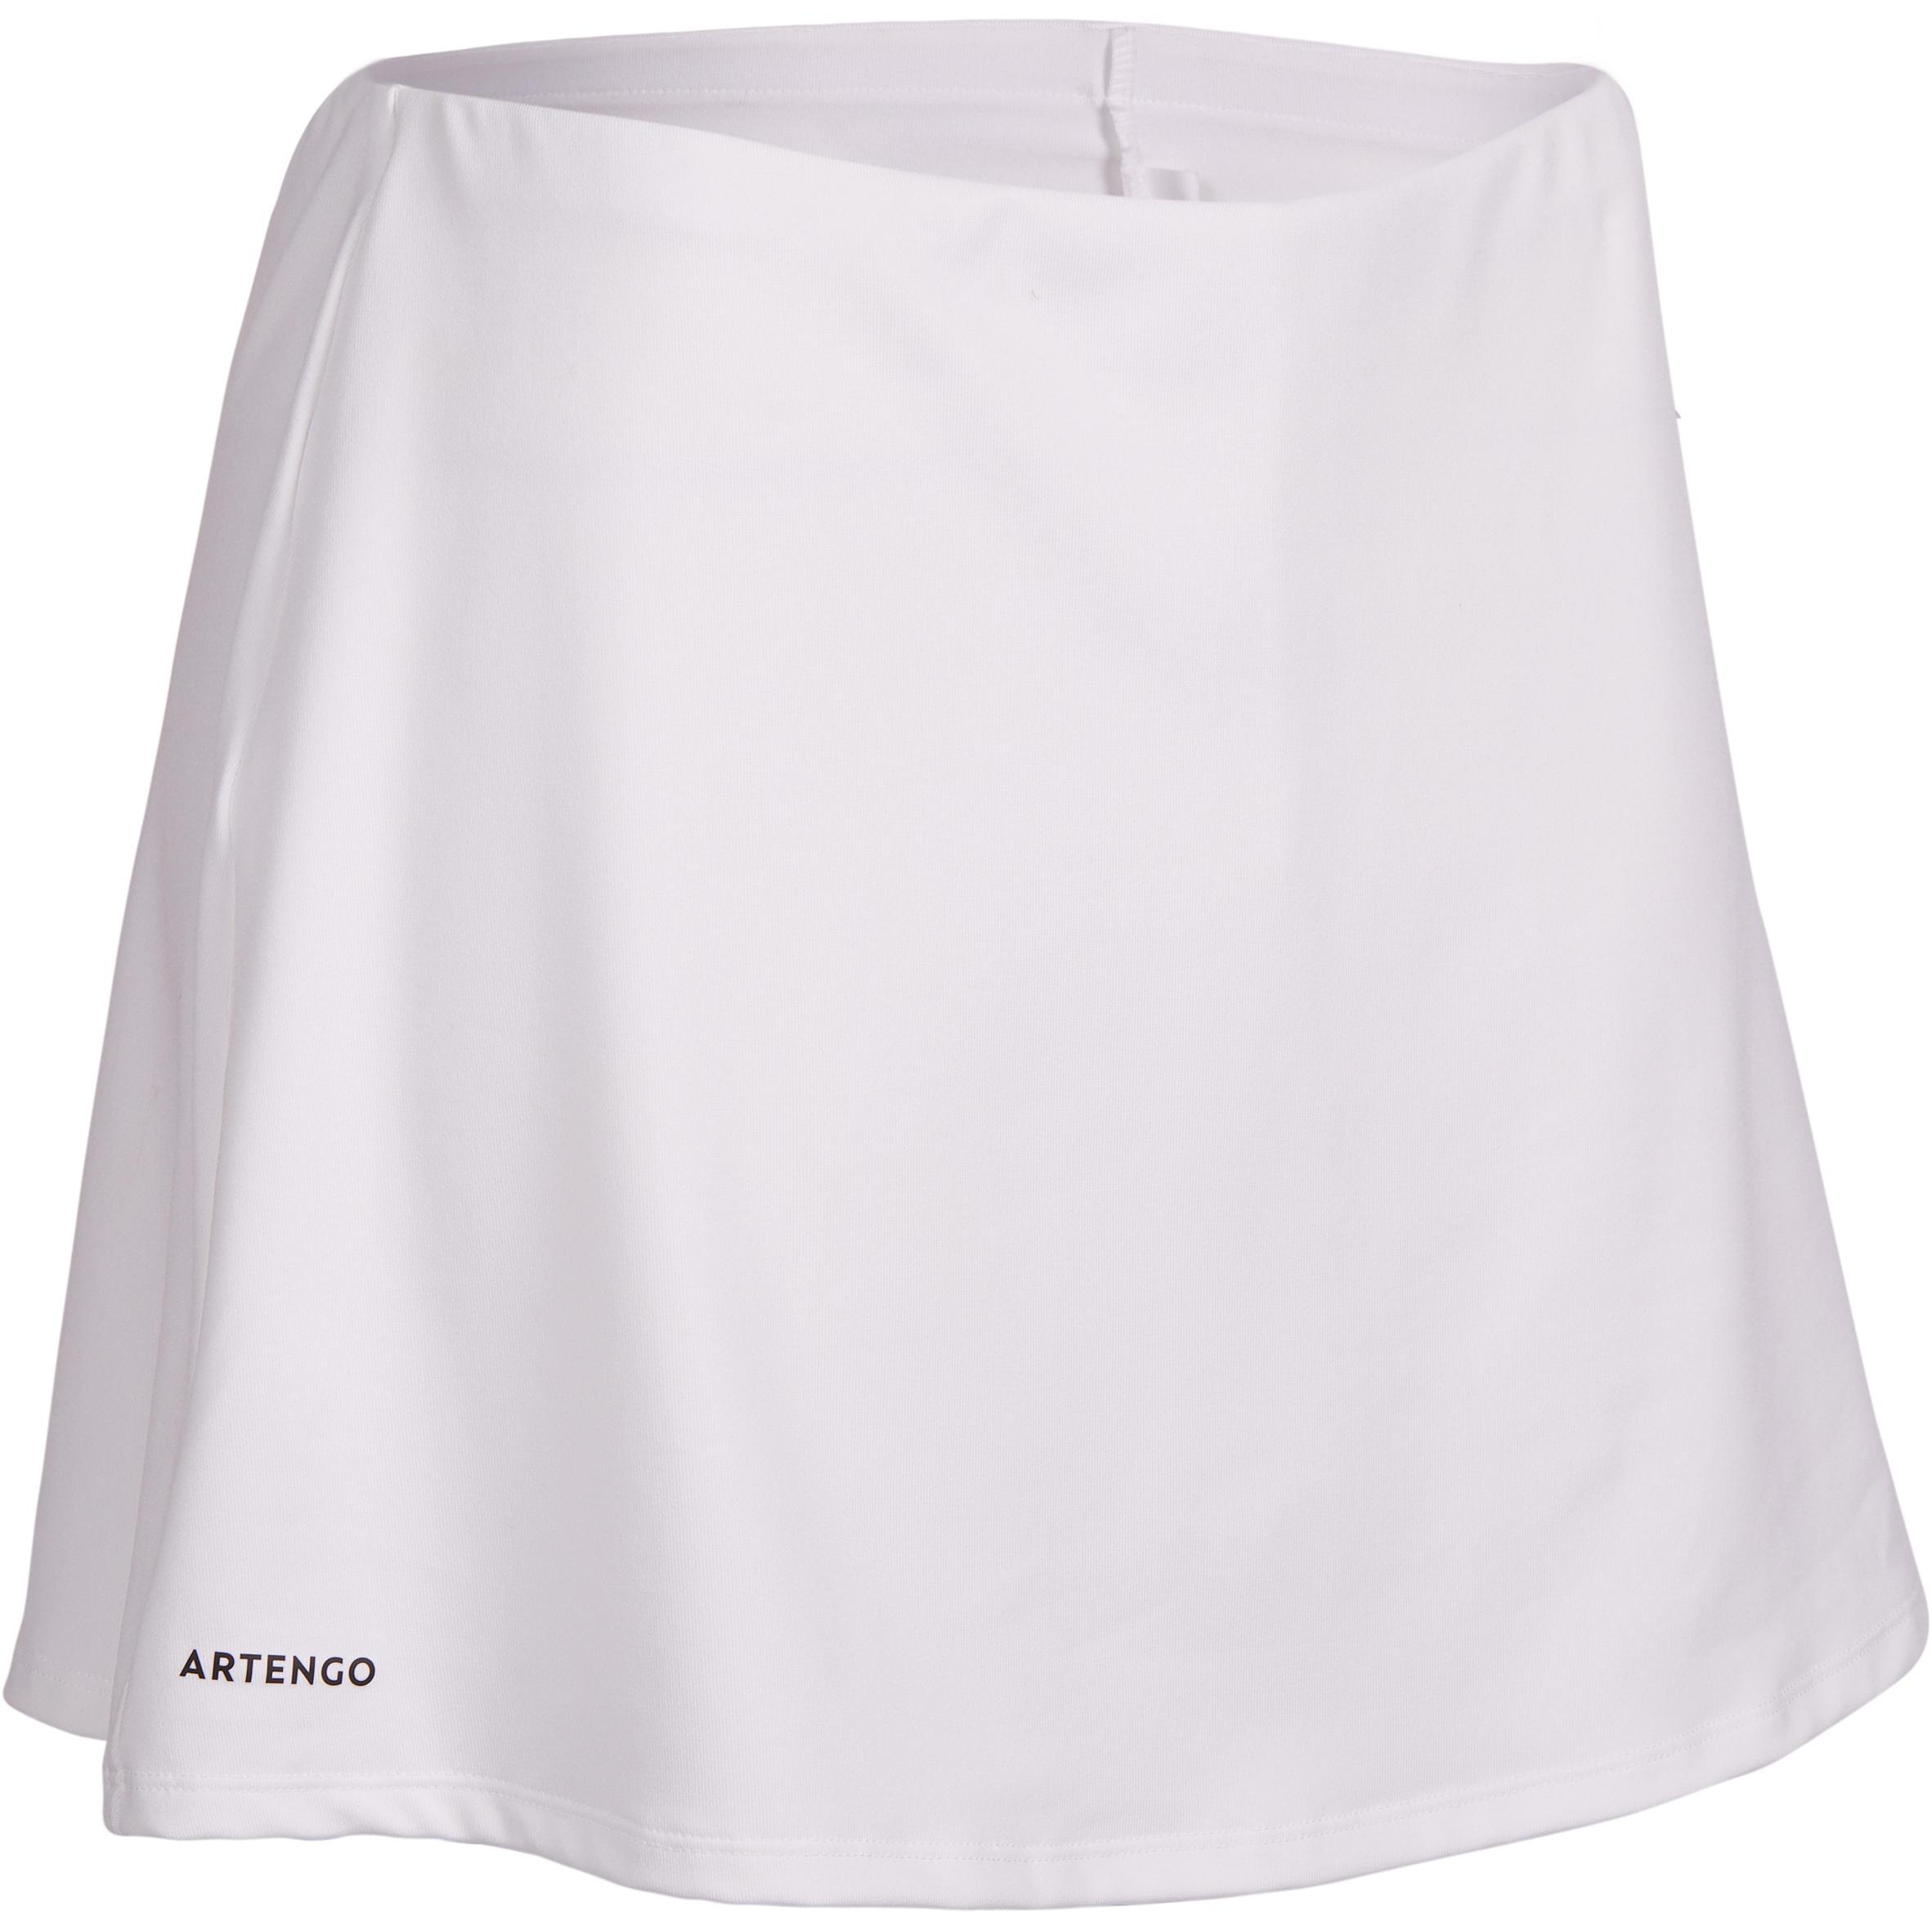 Tennisrock Essential 100 Damen weiß | Sportbekleidung > Sportröcke | Artengo